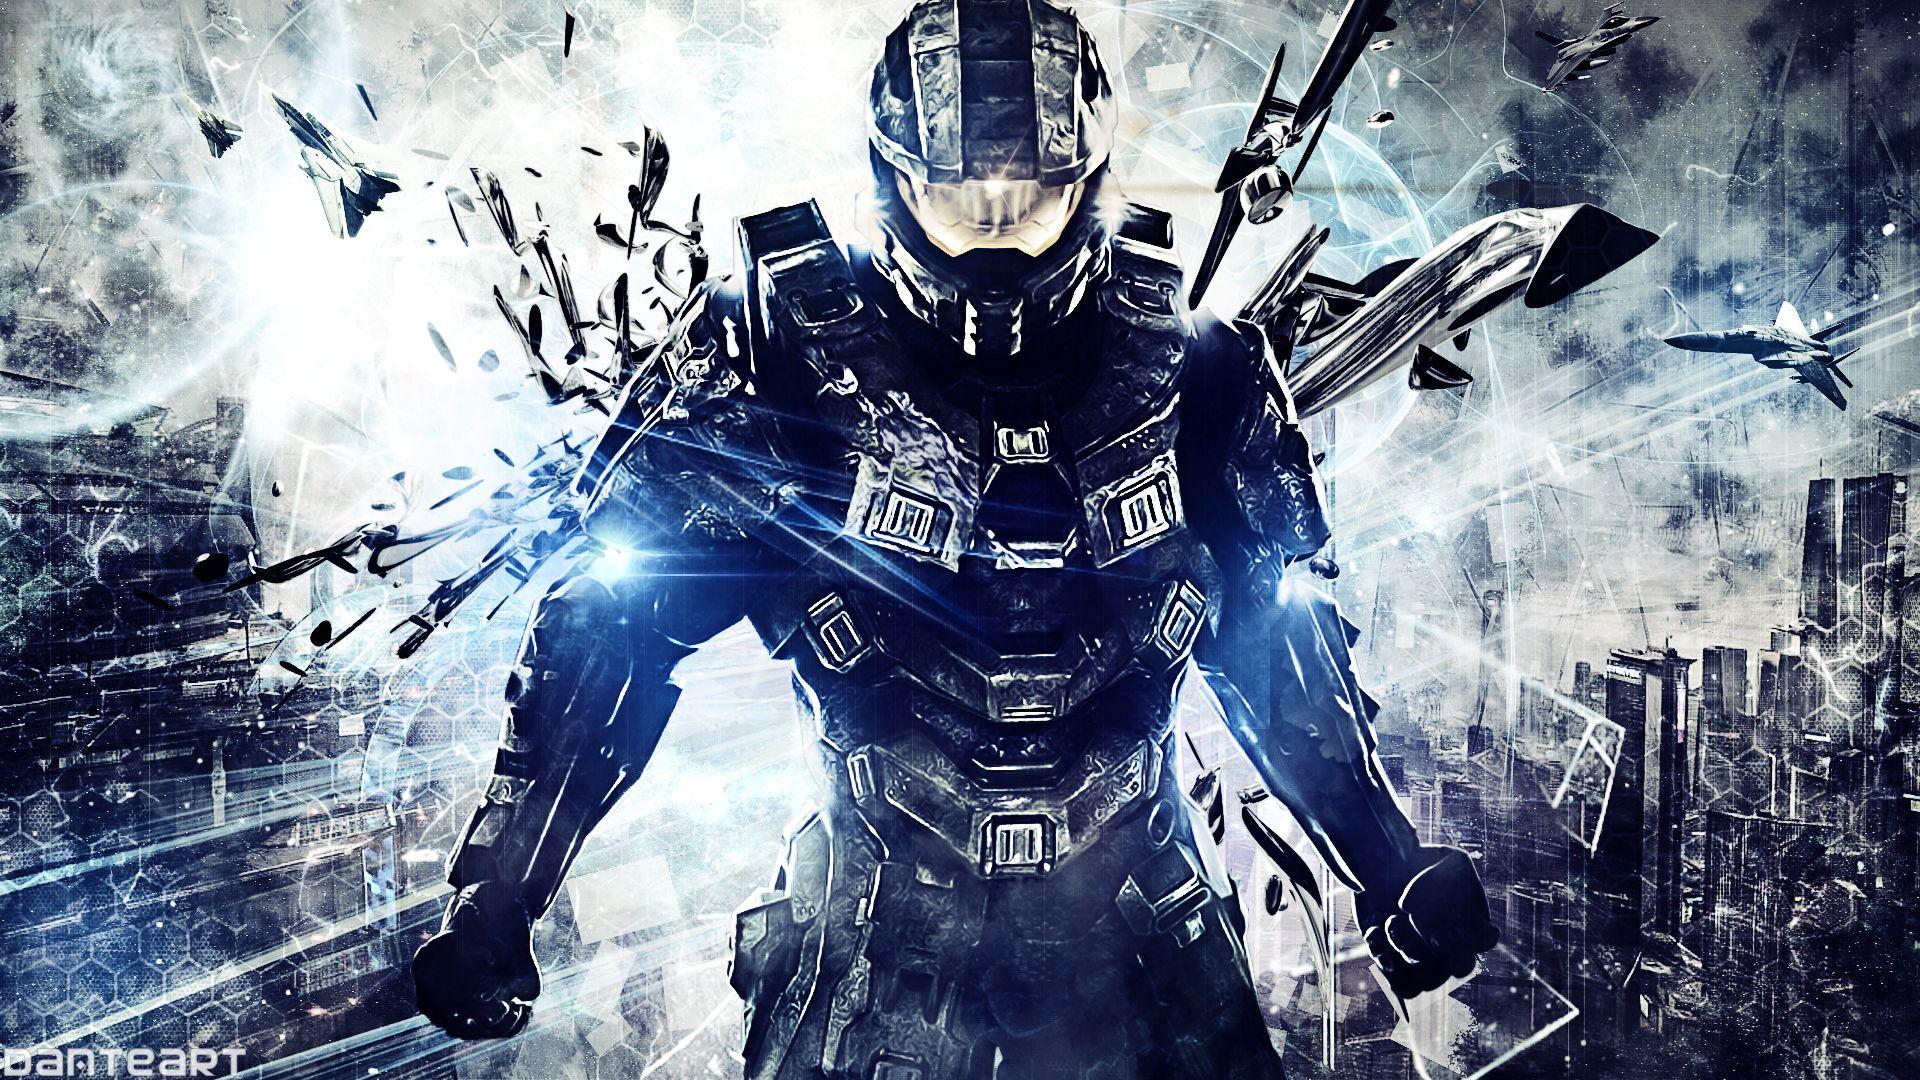 Halo 4 Hd Wallpaper Game 2014 Halo 4 Free Download Halo Master Chief Halo 5 Halo Game